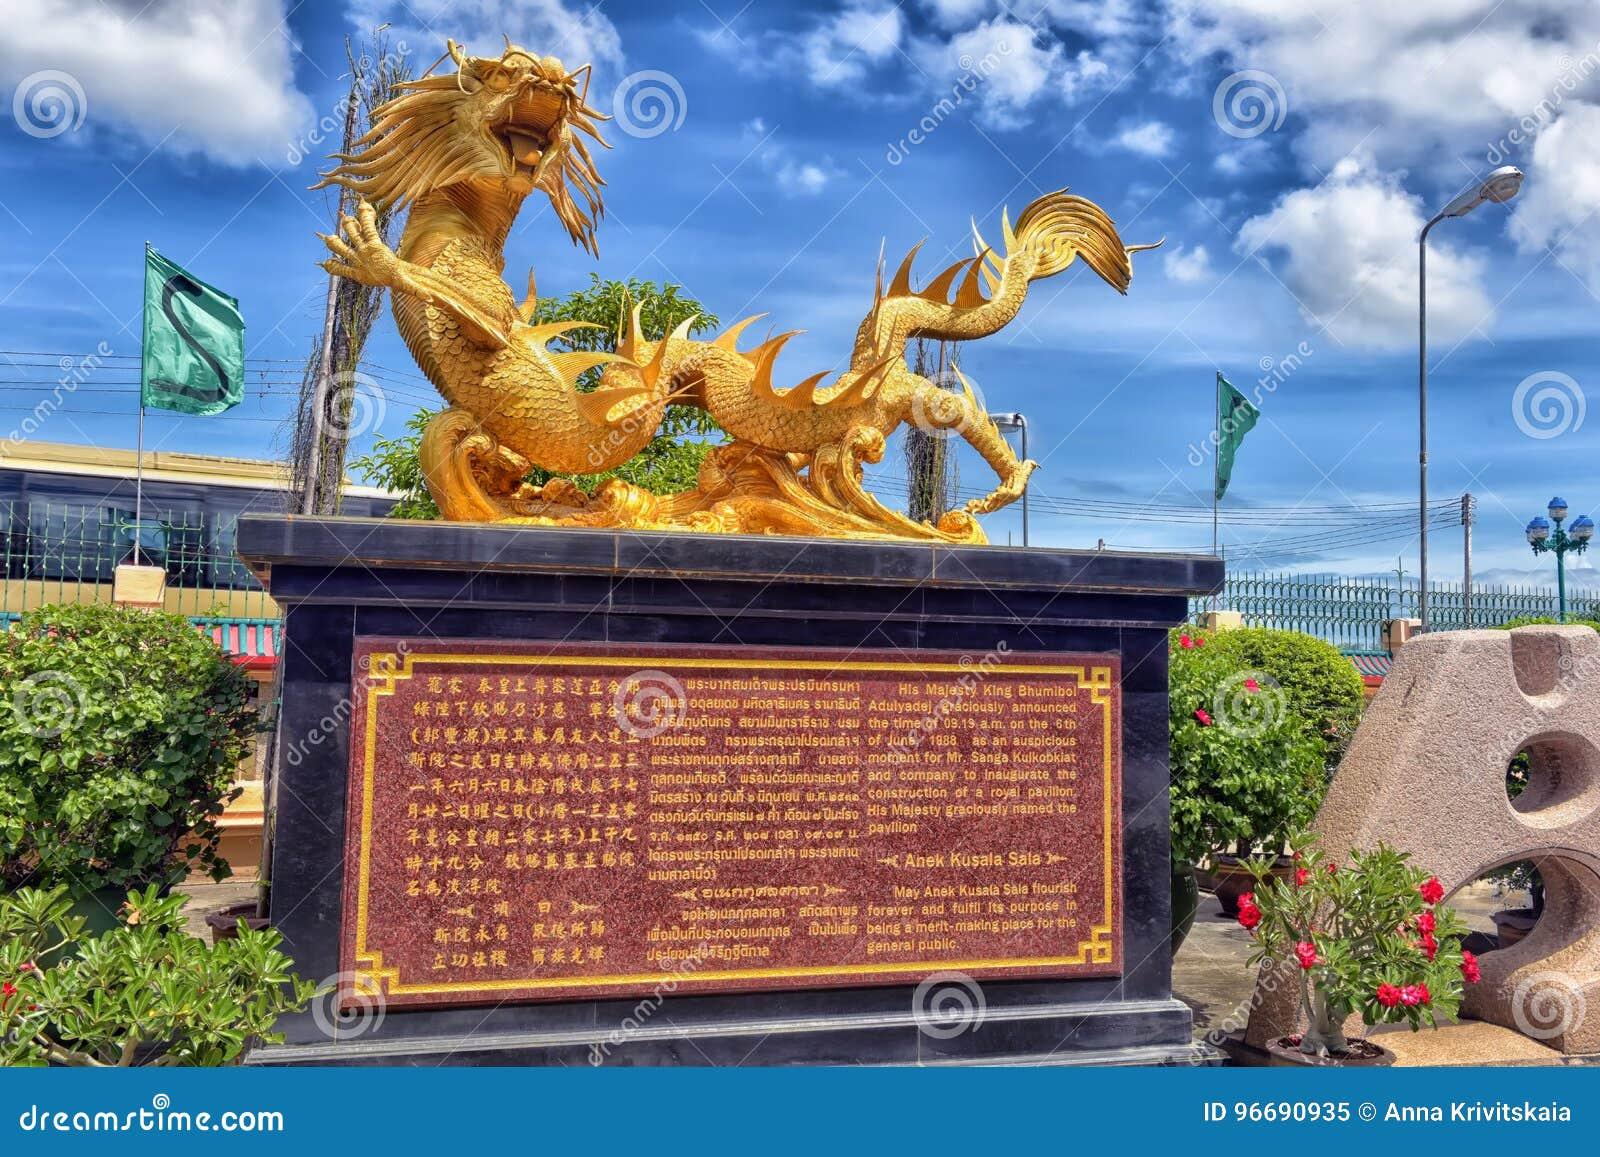 Mooi Chinees drakenbeeldhouwwerk bij de Chinese tempel van Anek Kusala Sala Viharn Sien in Pattaya,